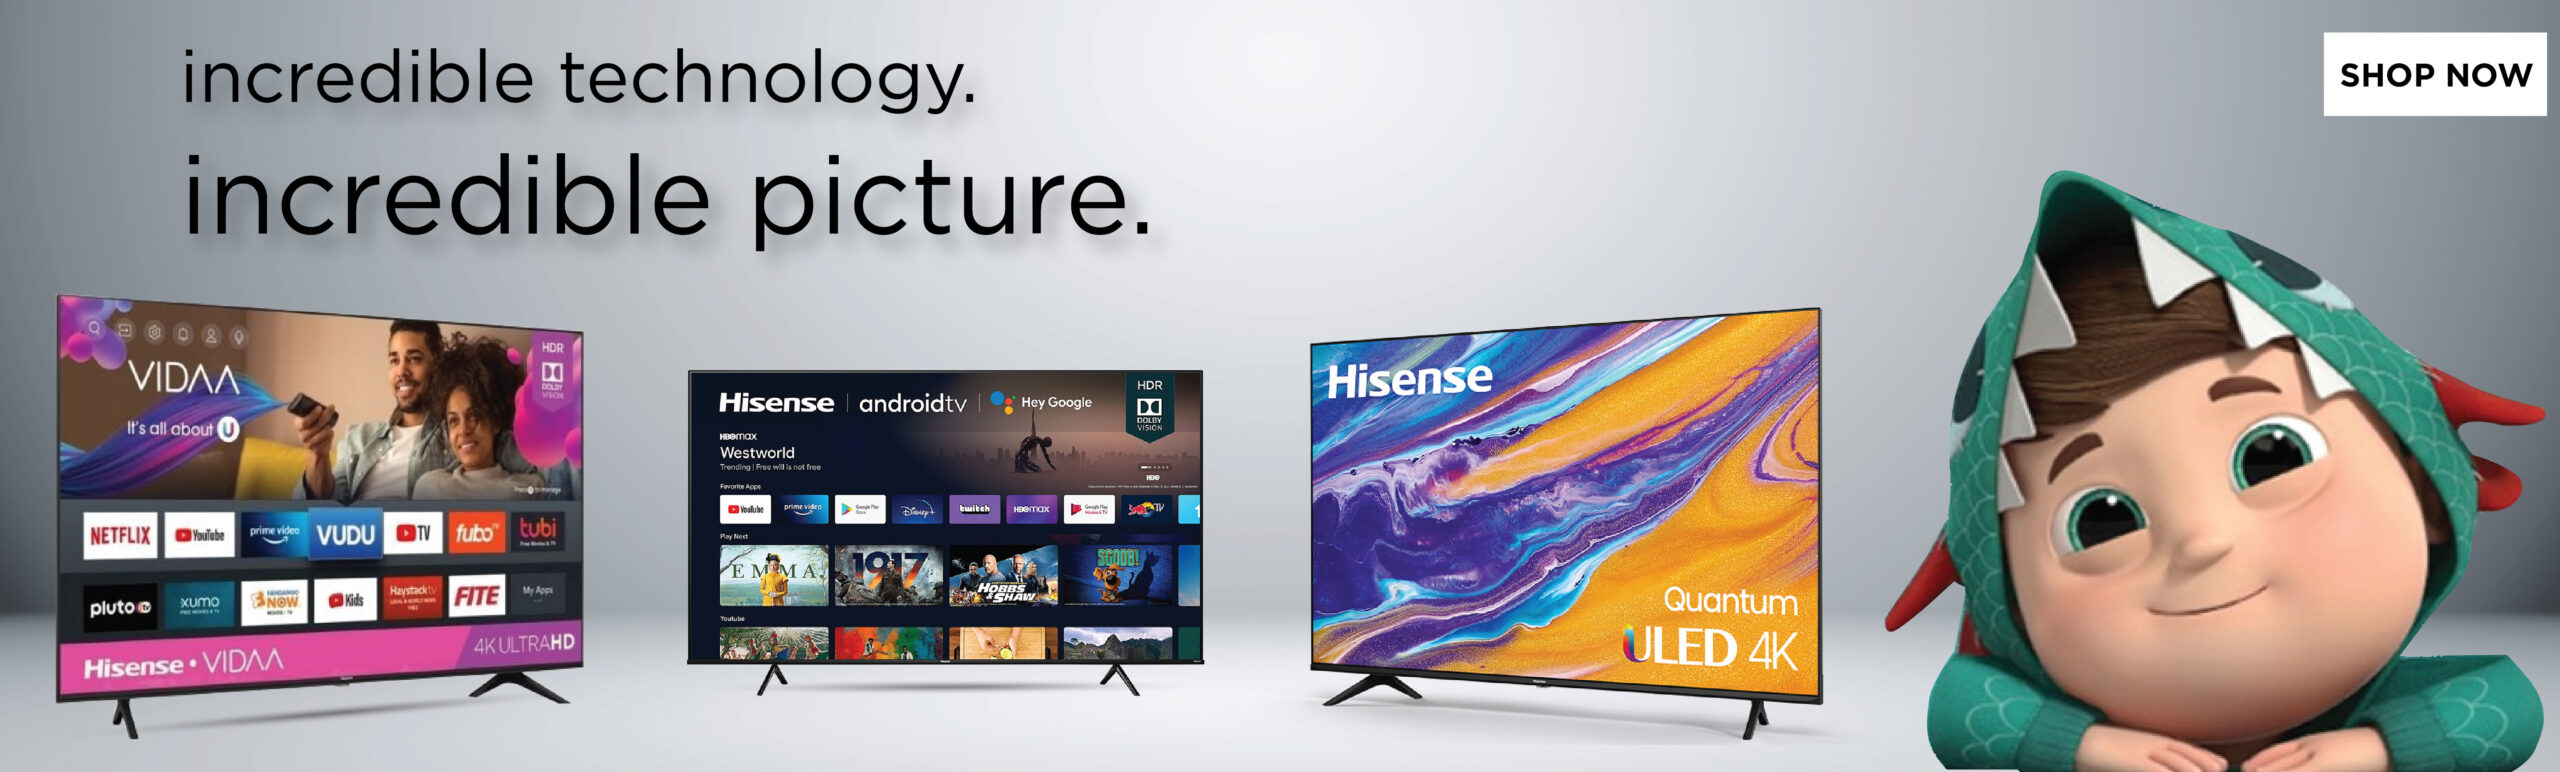 Hisense TVs scaled